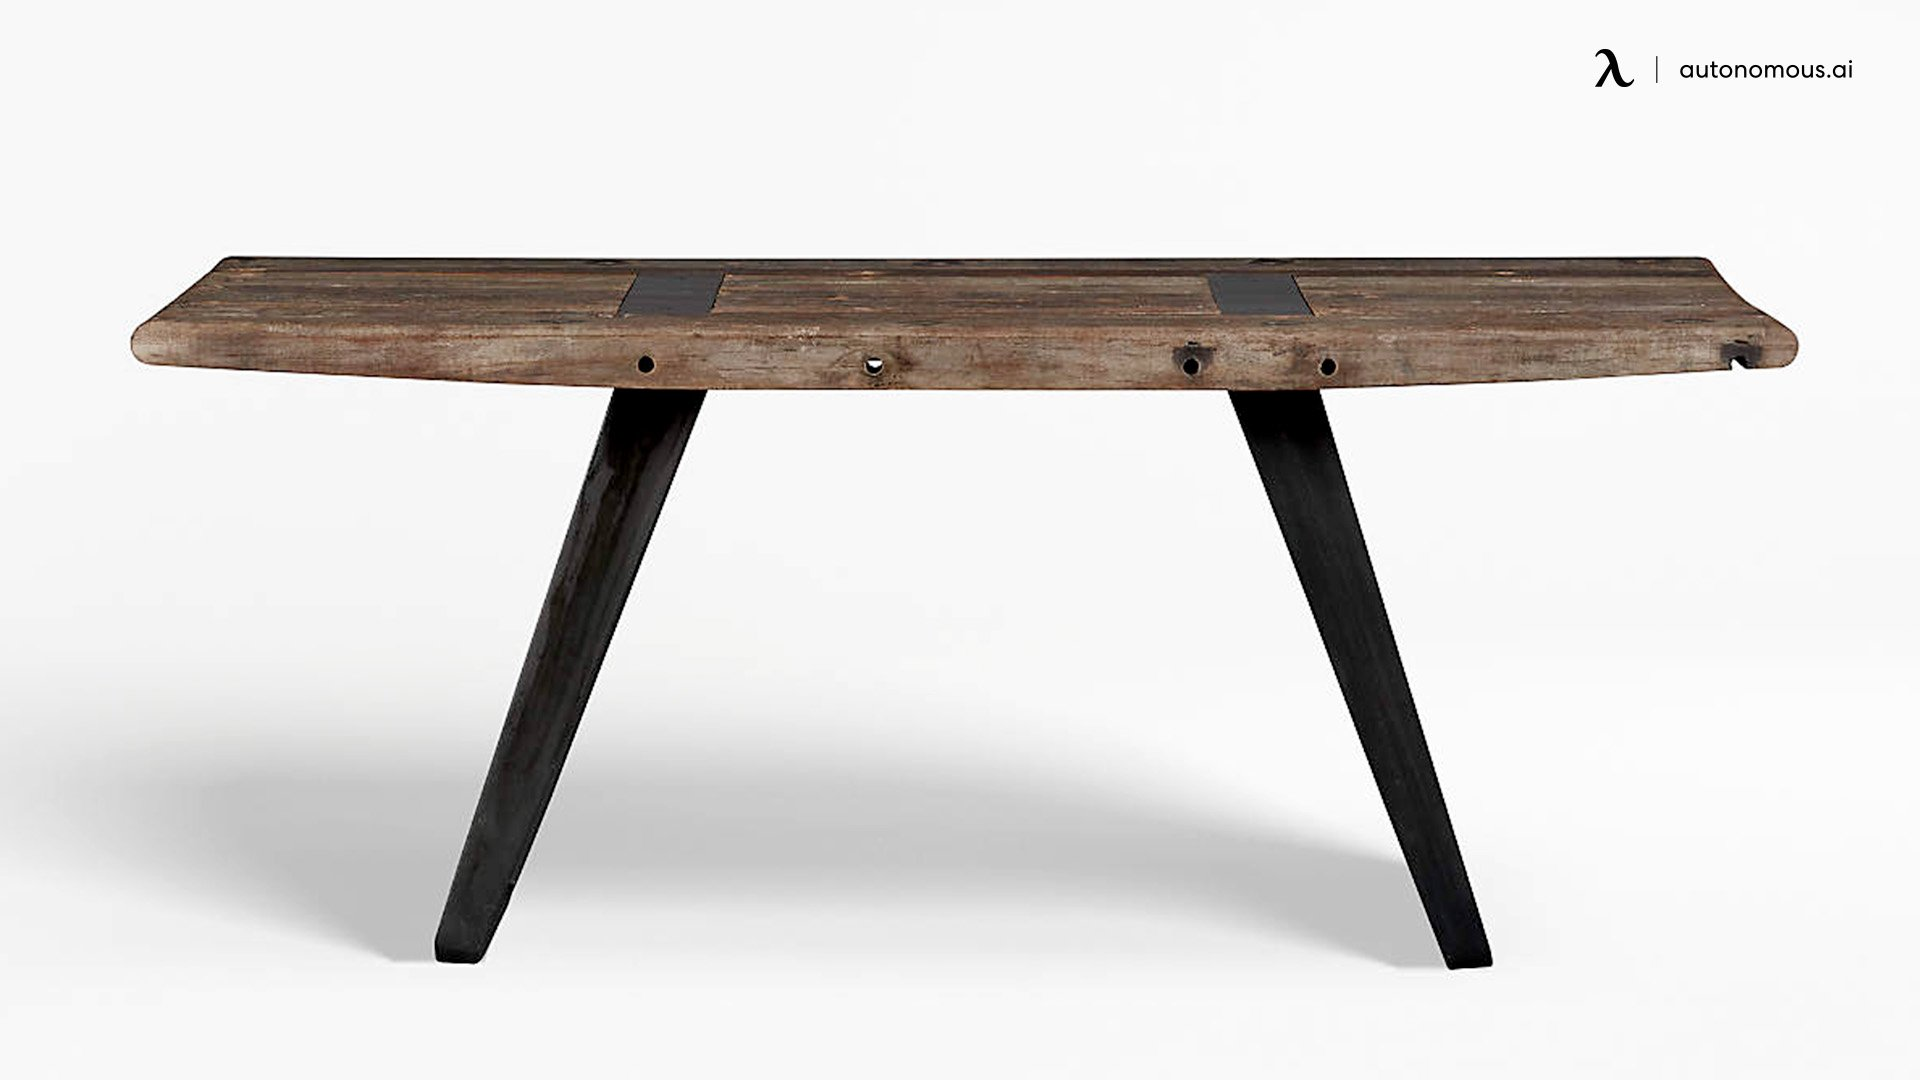 The Phoenix Rustic Wood Work Table